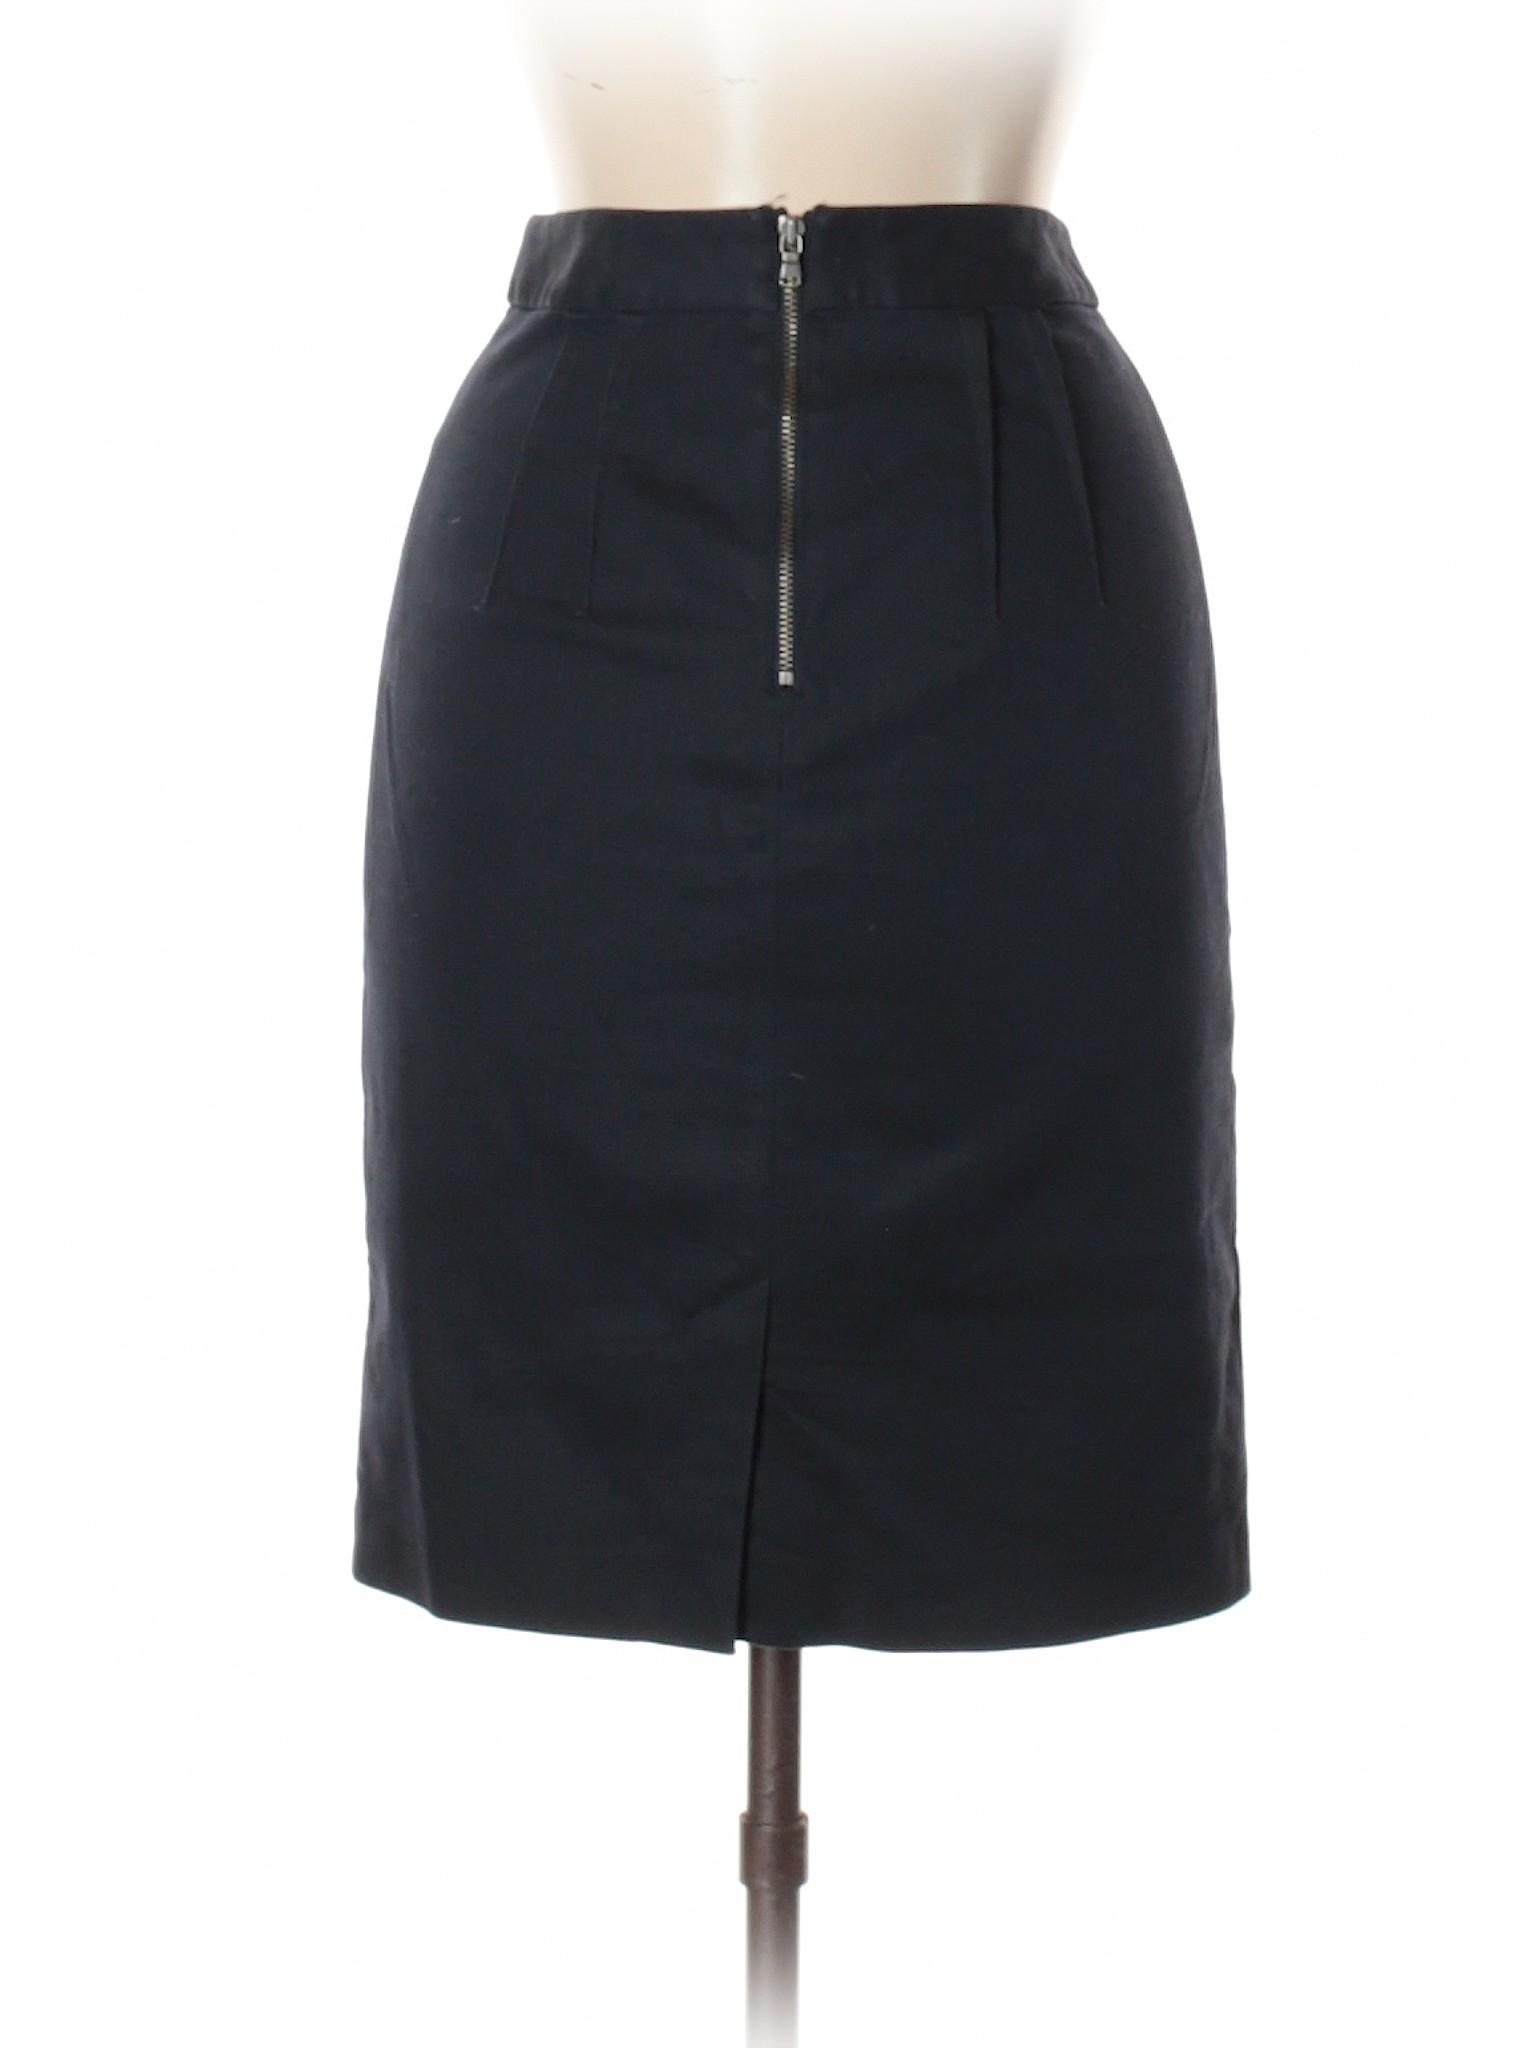 Skirt Boutique Boutique Casual Casual IwZtqP